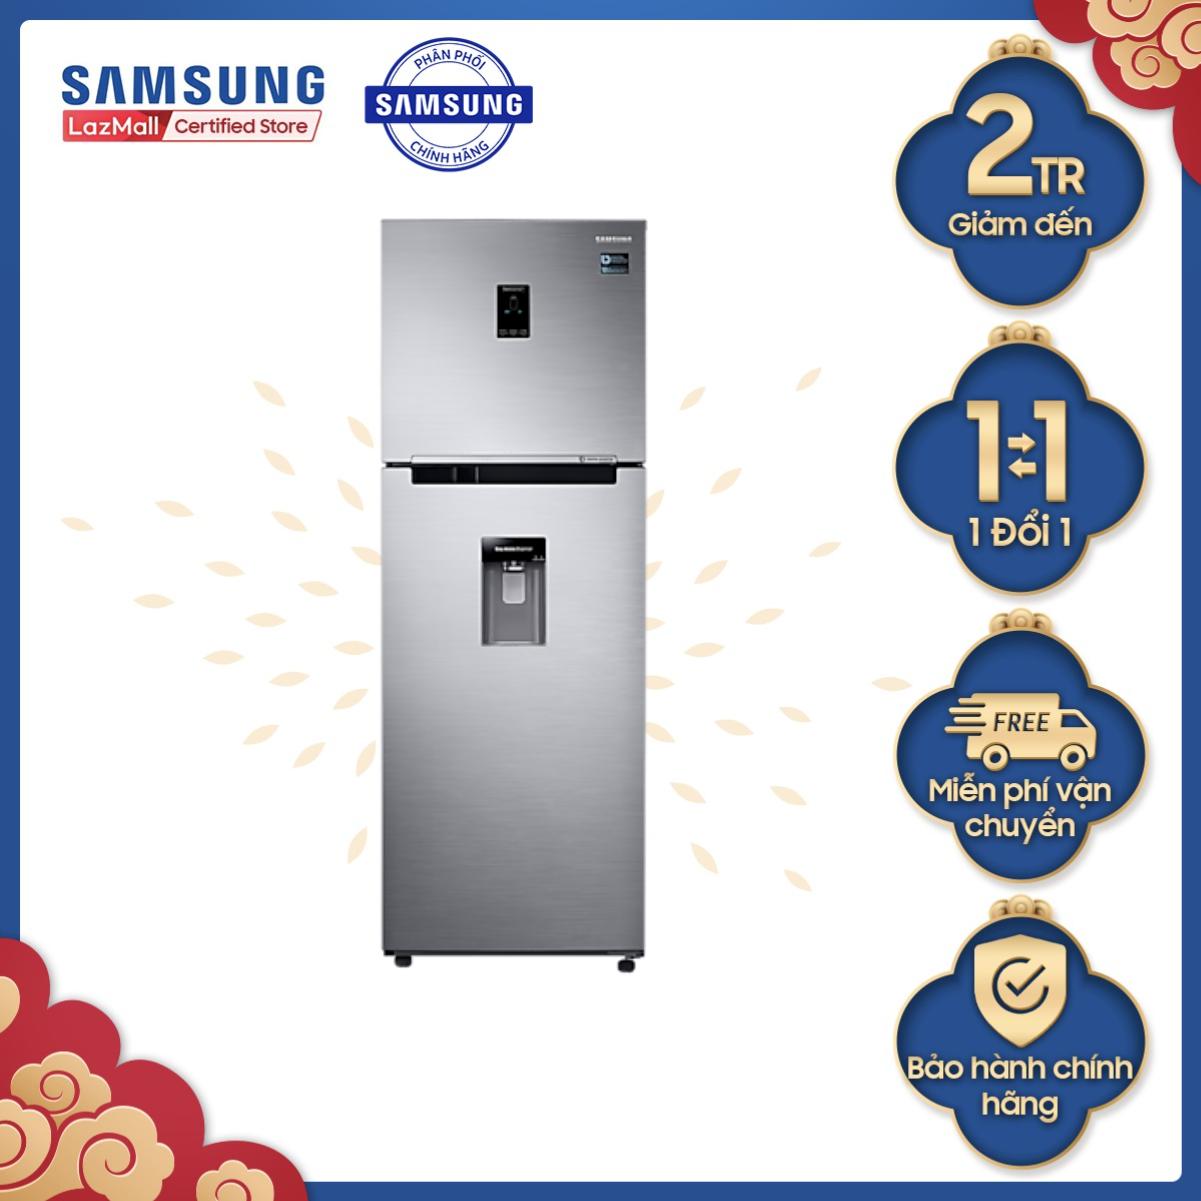 (Voucher 250K) Tủ lạnh Samsung hai cửa Twin Cooling Plus 327L (RT32K5932S8)